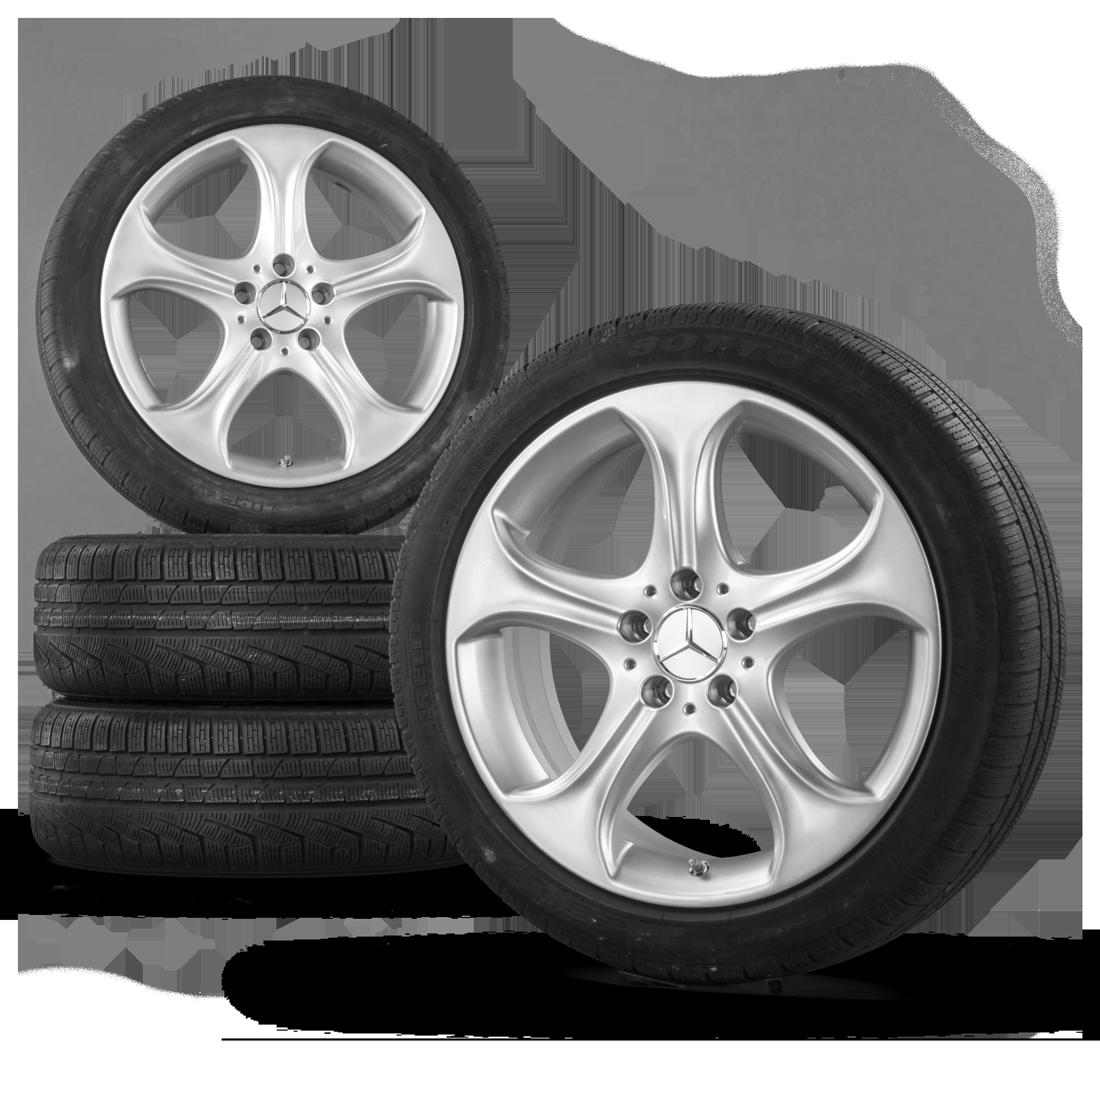 18 inch winter wheels alloy wheels mercedes benz w205 s205 for Mag wheels for mercedes benz